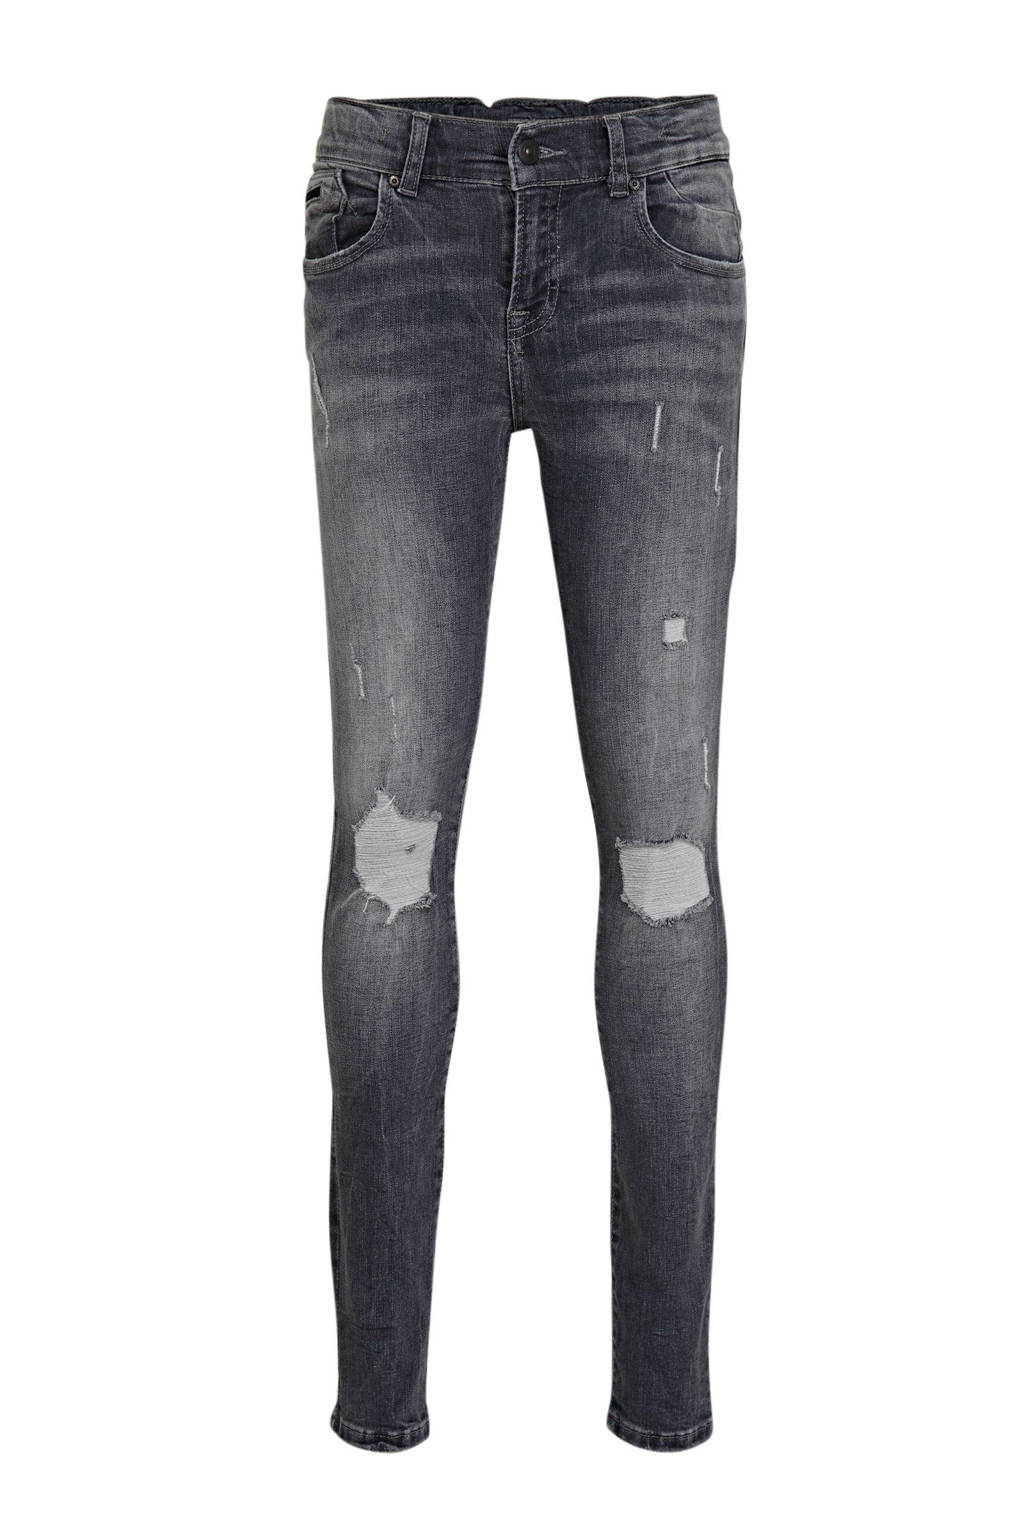 LTB super skinny jeans Ravi met slijtage renell wash, Renell wash